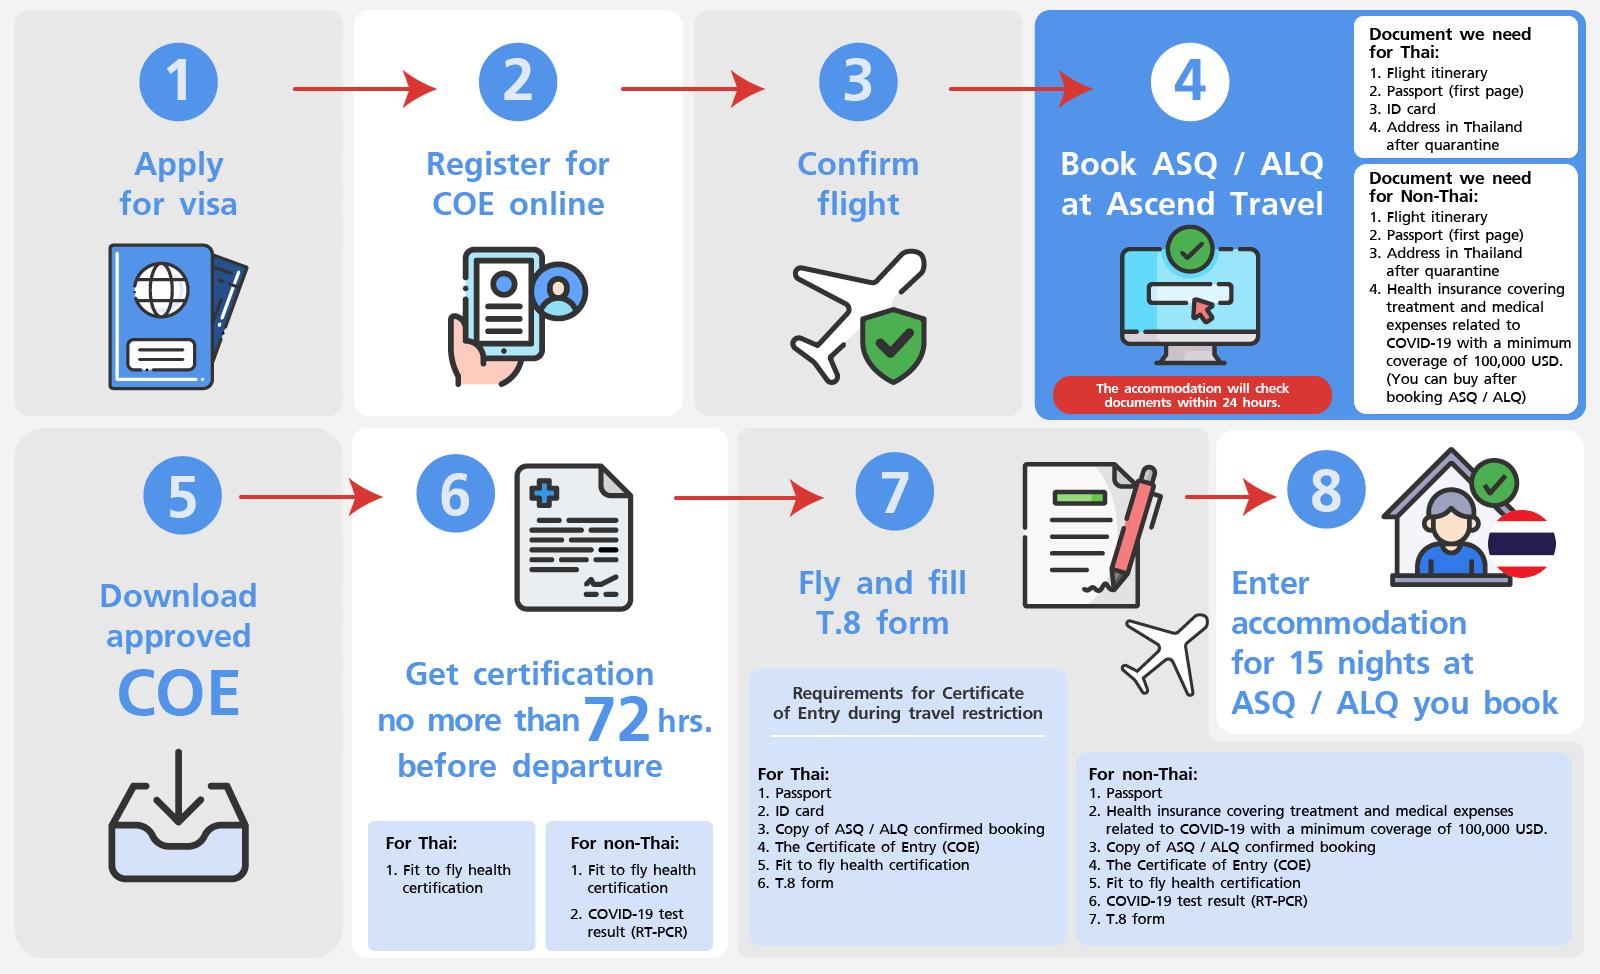 ASQ / ALQ Booking step suggestion